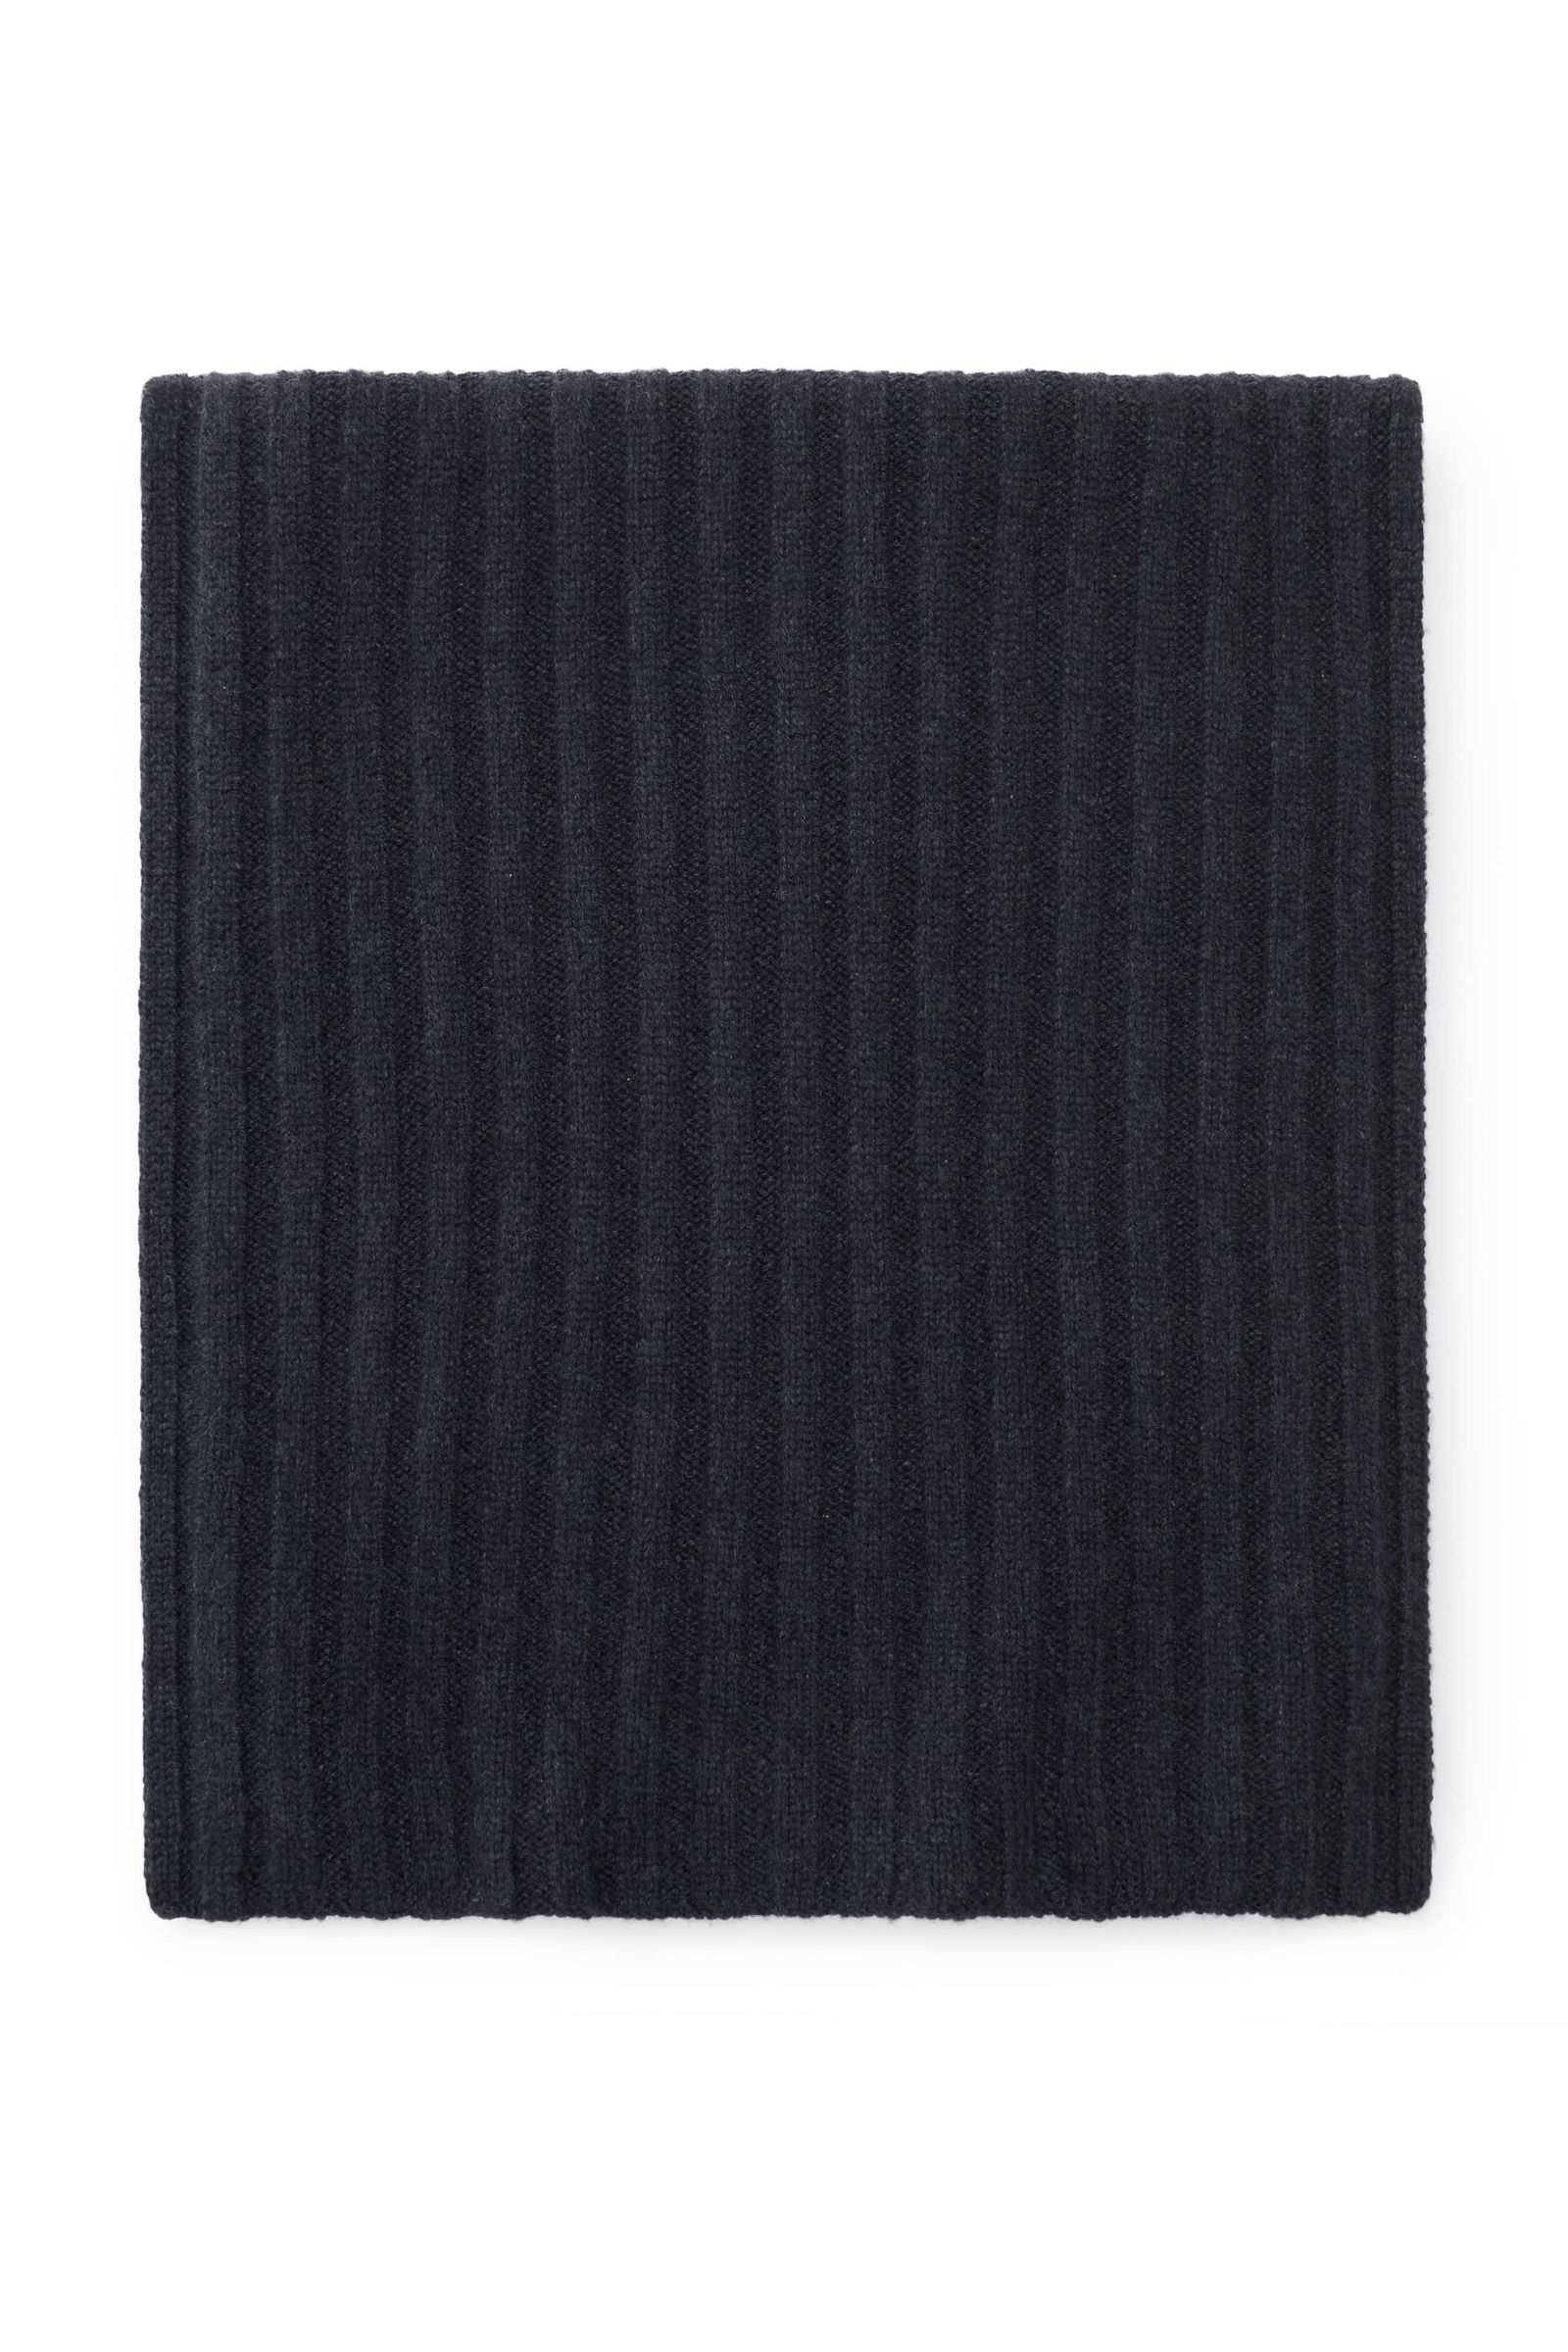 Cashmere scarf anthracite